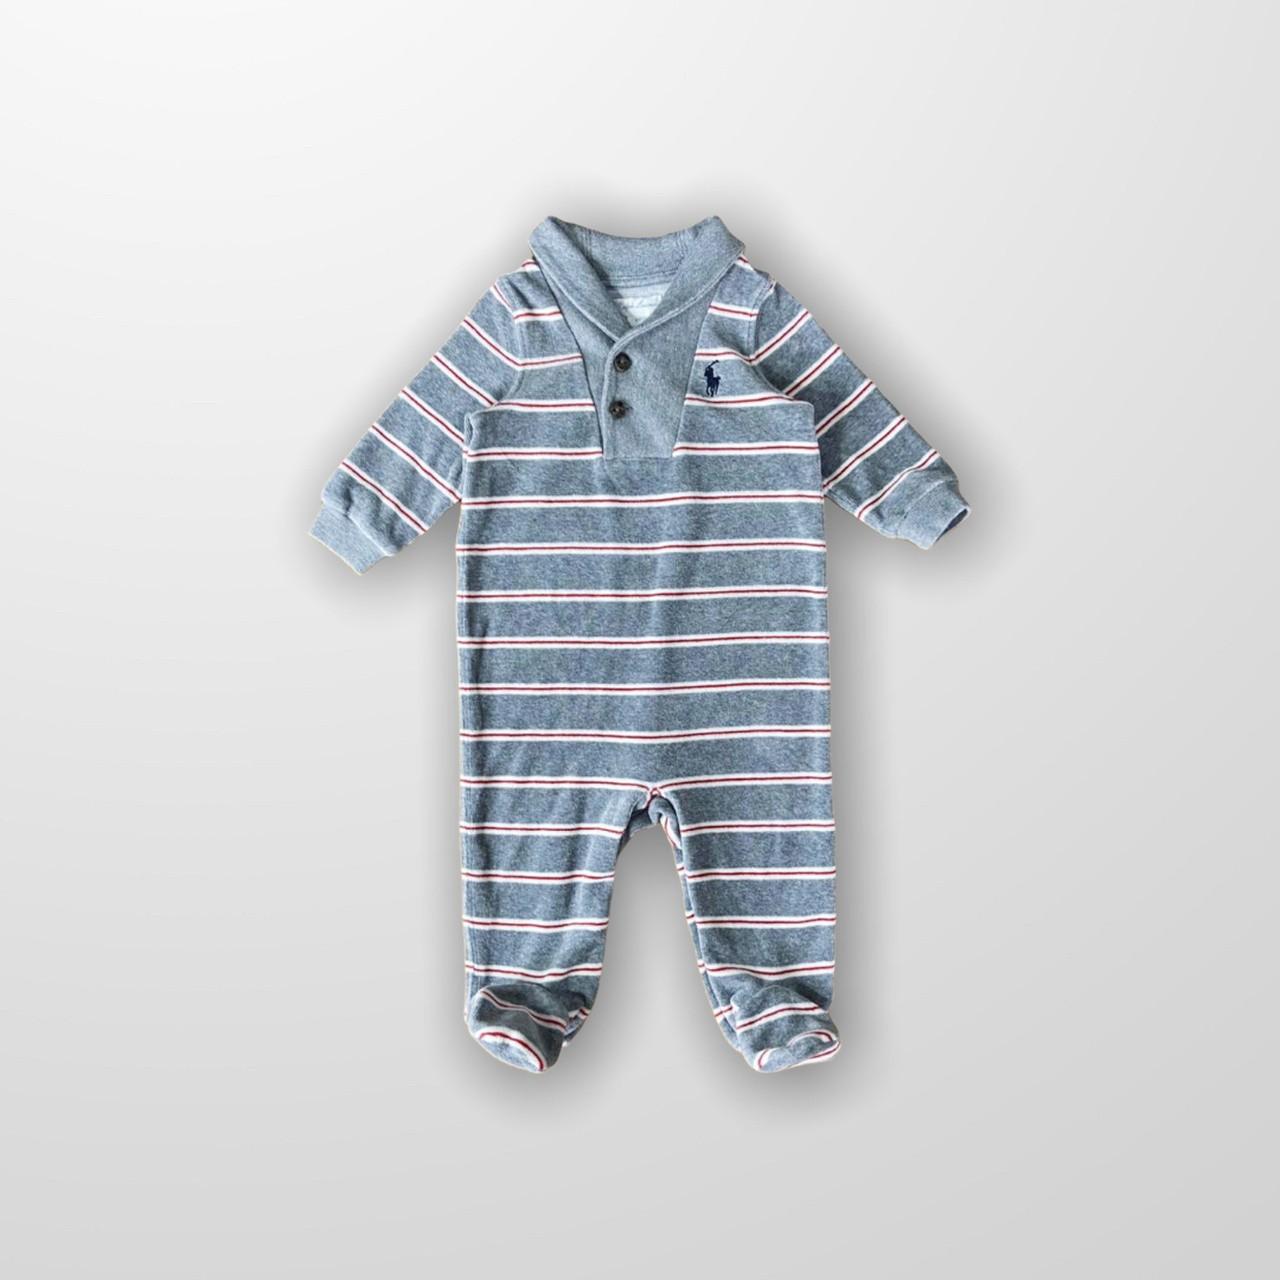 Macacão Ralph Lauren 6 meses